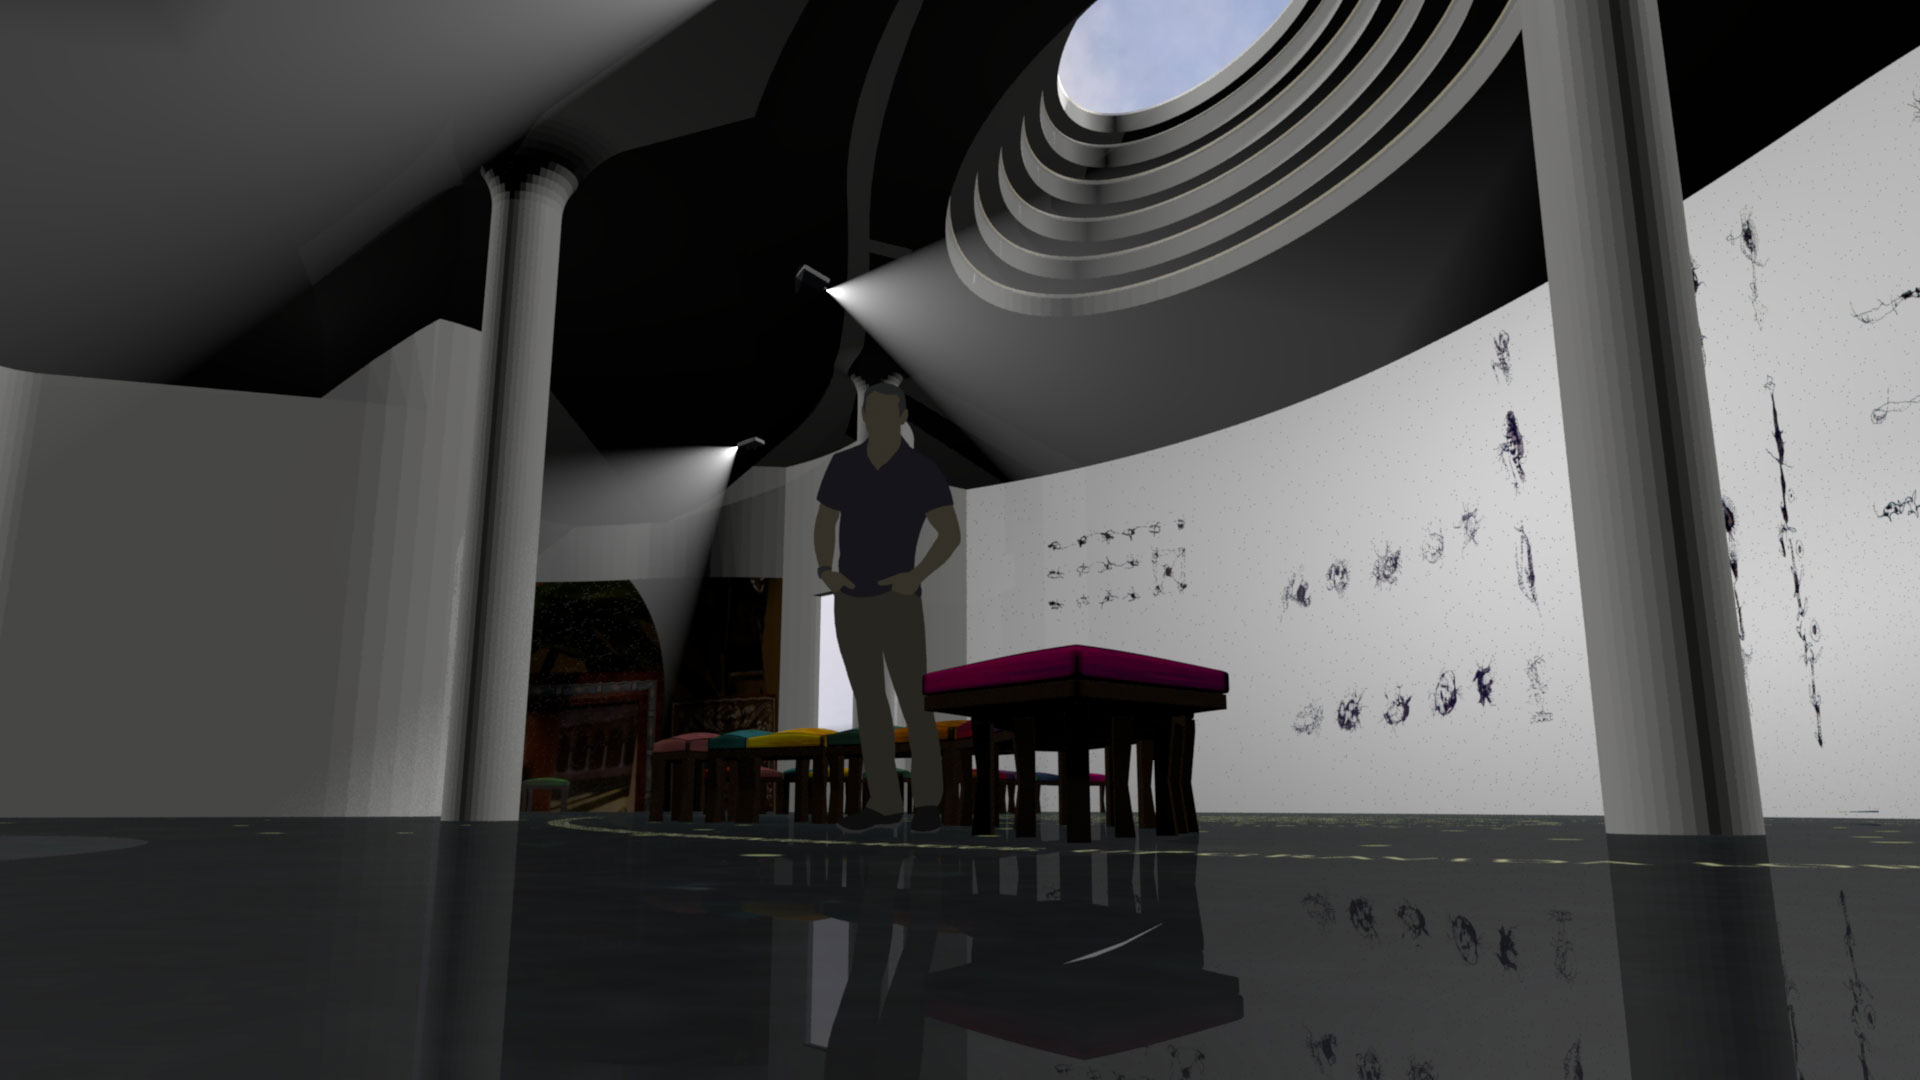 Lebadang-interieur-LBDSpace-02-Helene-Mugot-2018